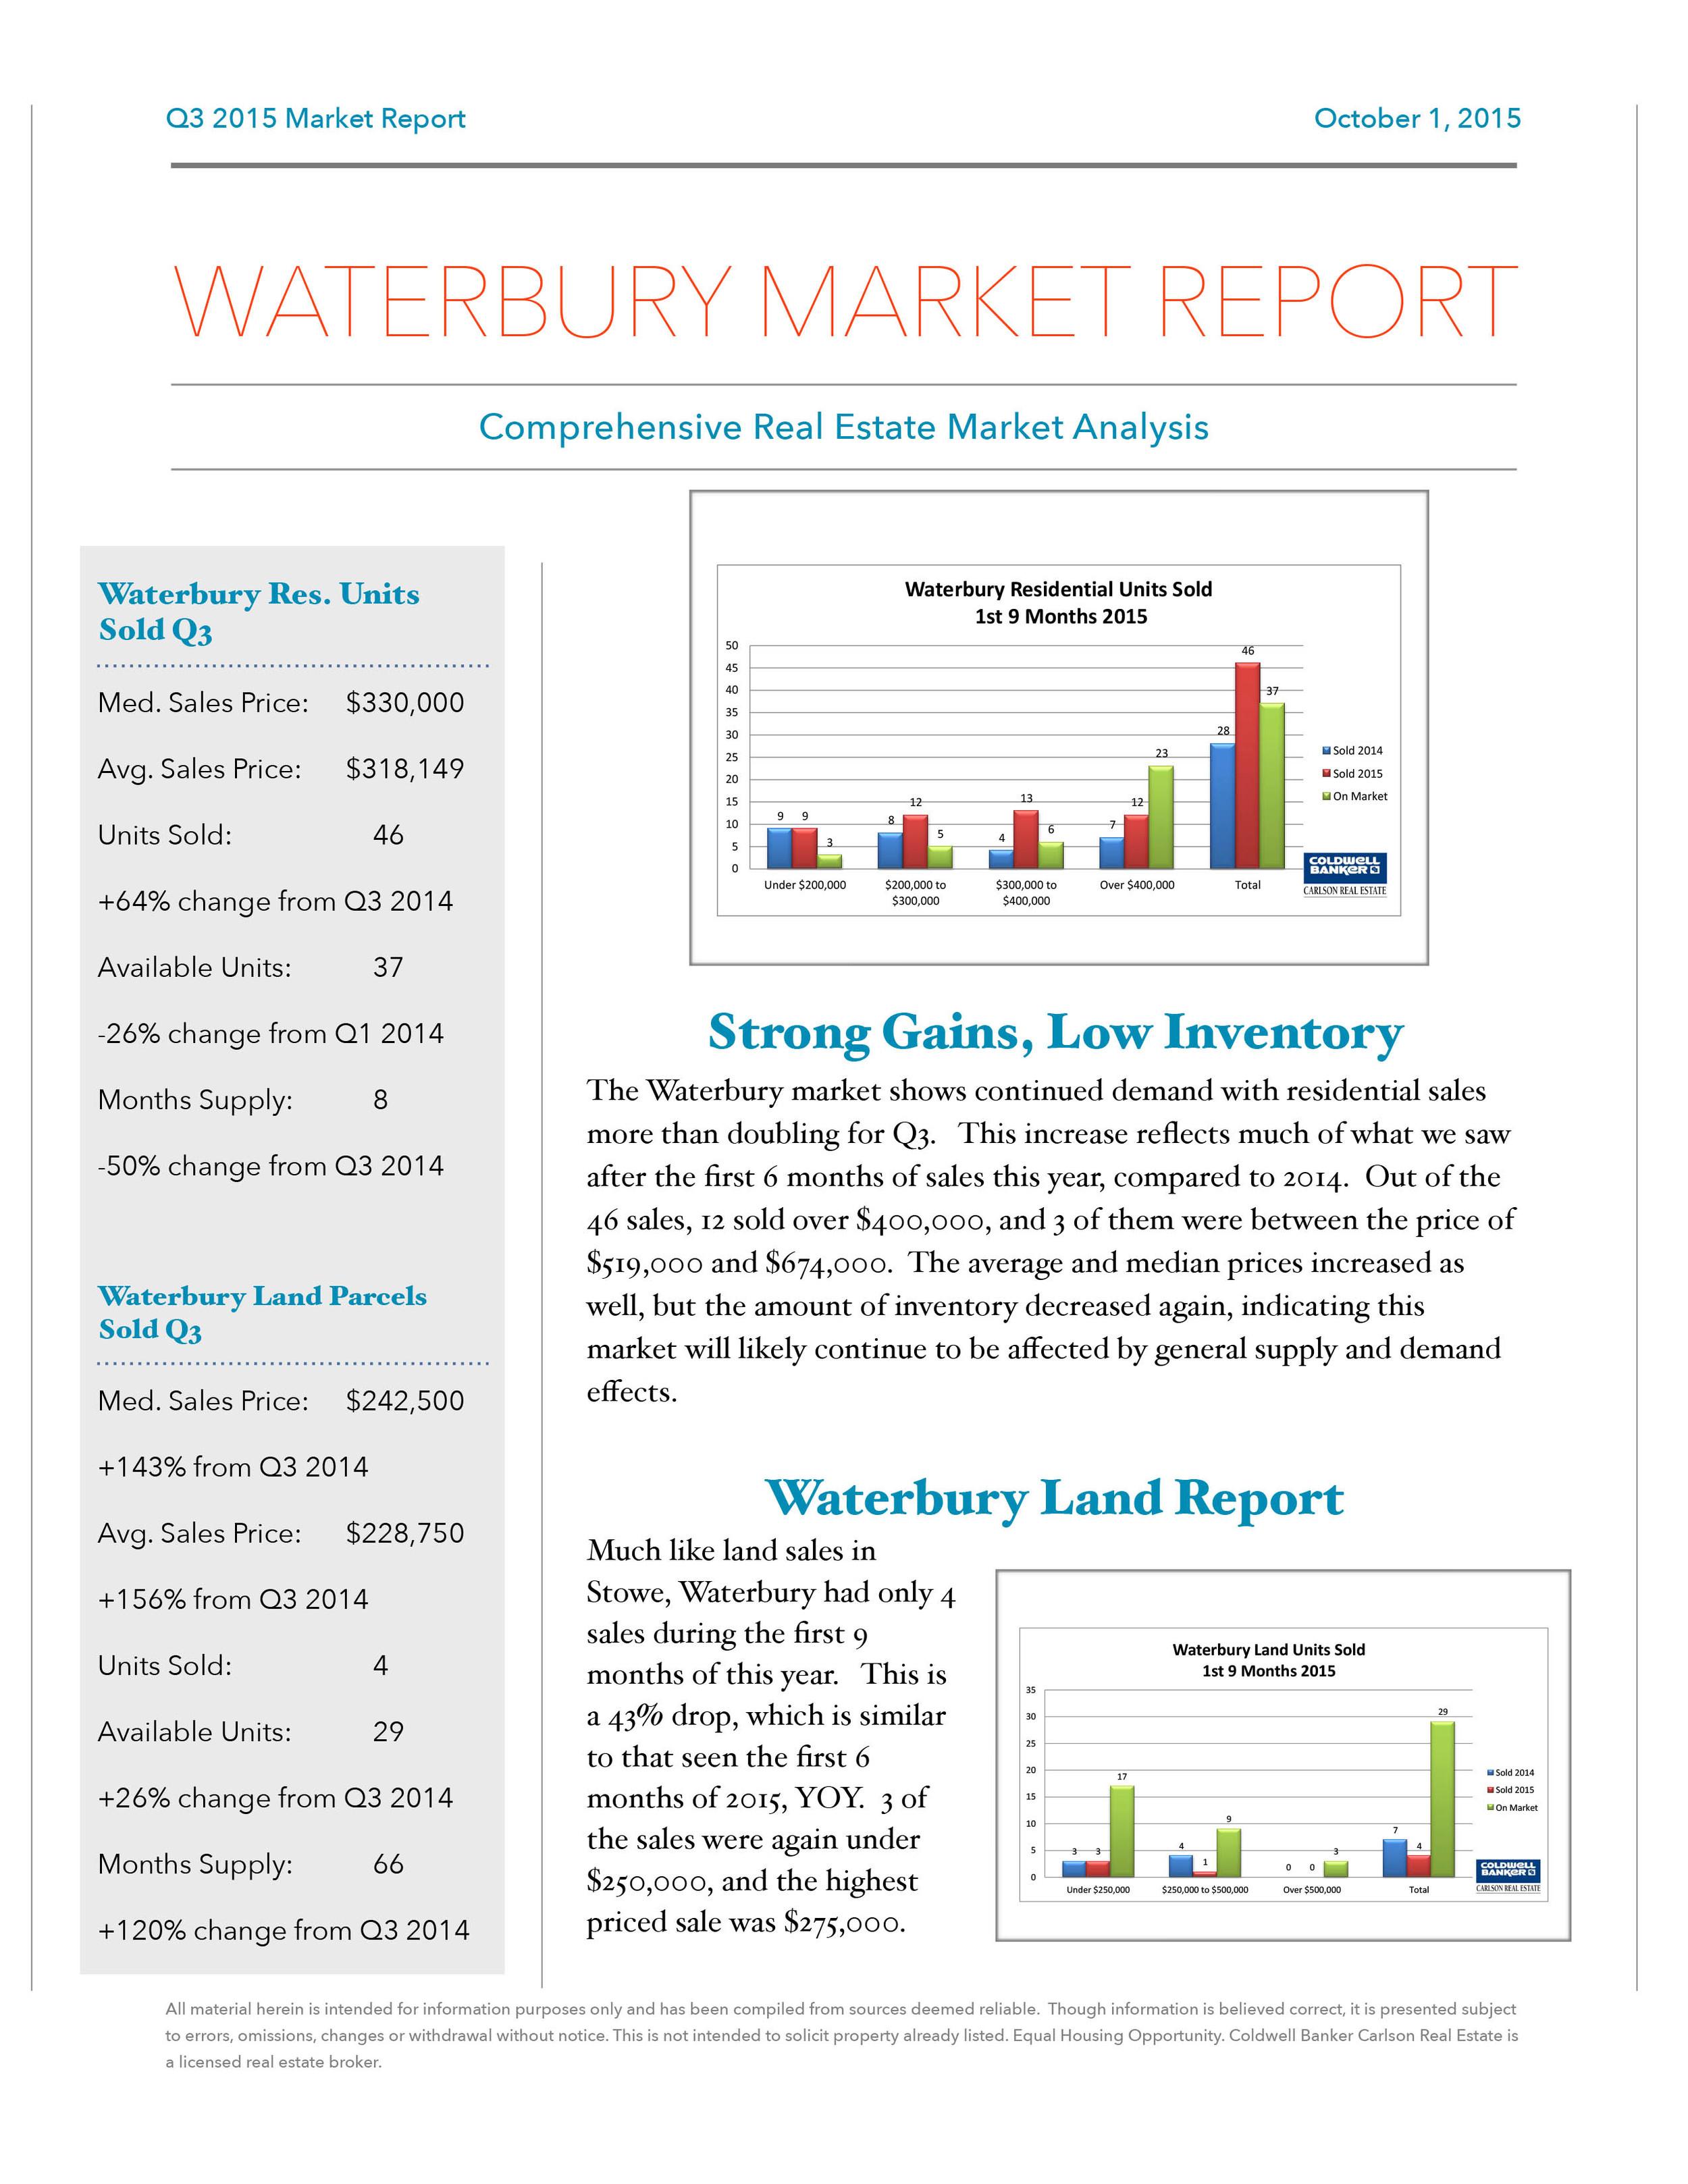 Q3 2015 Market Report Draft Waterbury